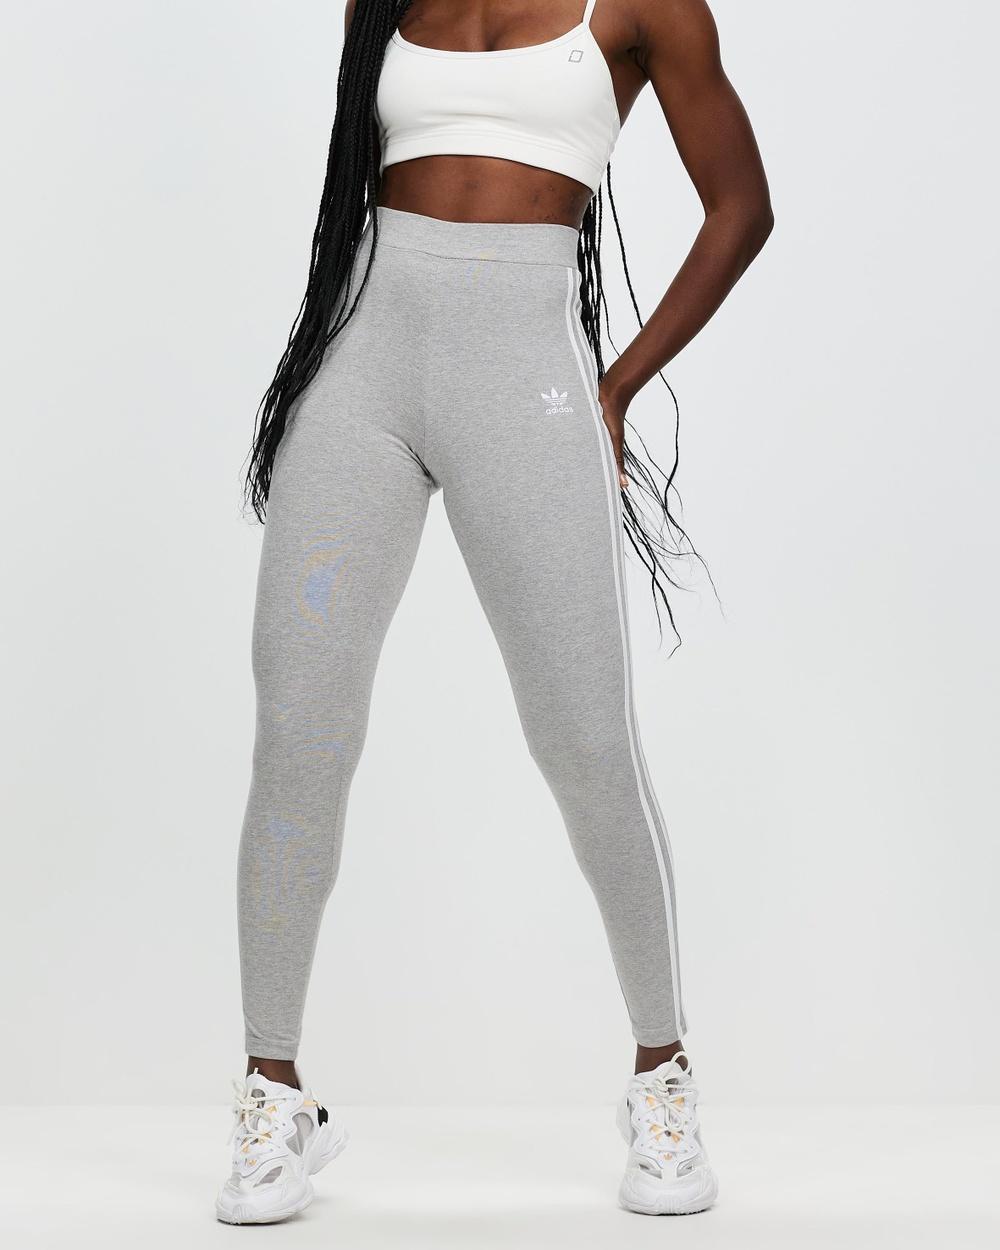 adidas Originals 3 Stripes Tights Full Medium Grey Heather 3-Stripes